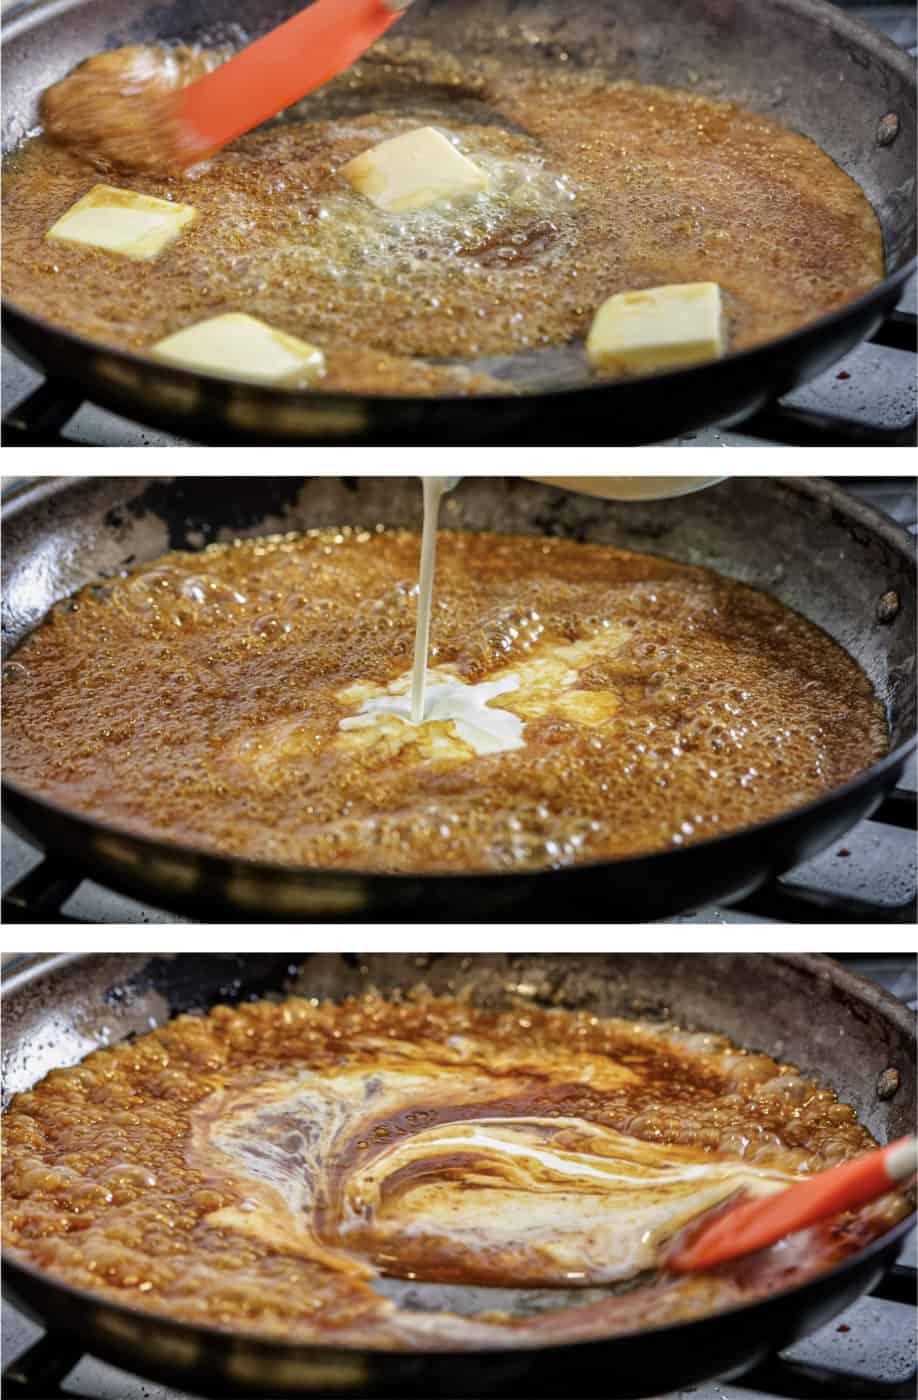 process steps for making homemade caramel sauce